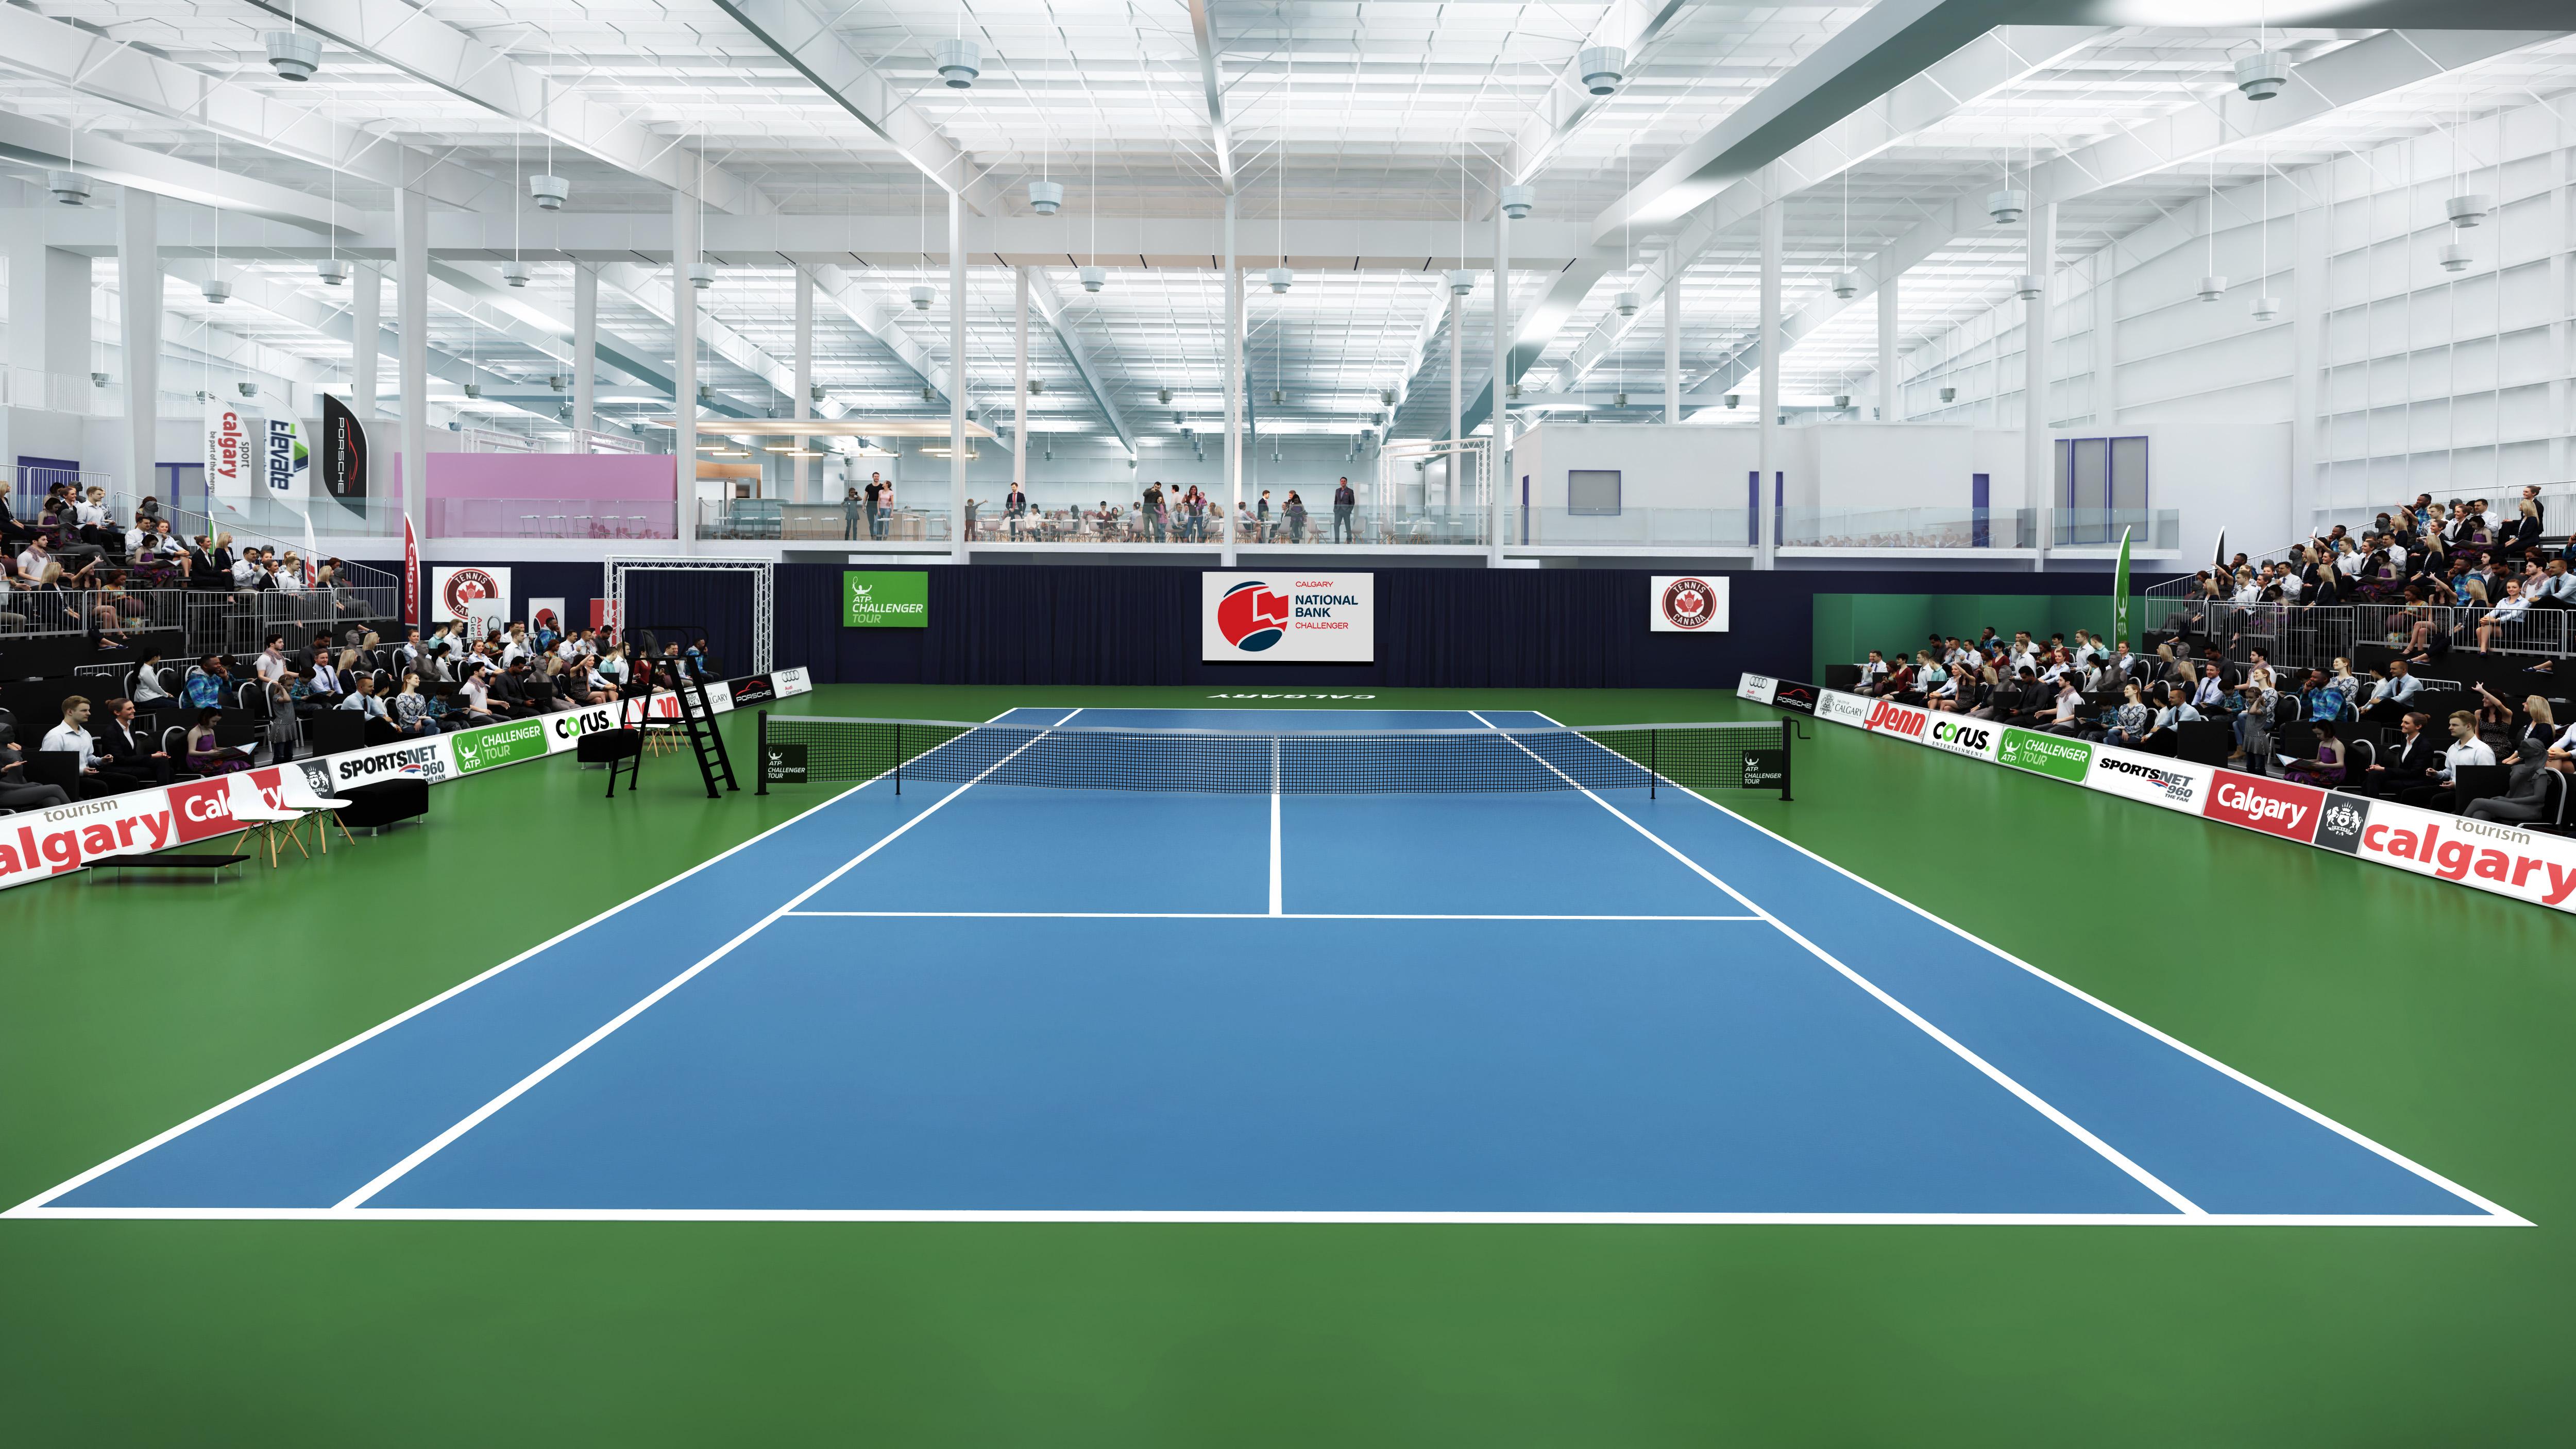 tourism calgary helping bring world class tennis to calgary